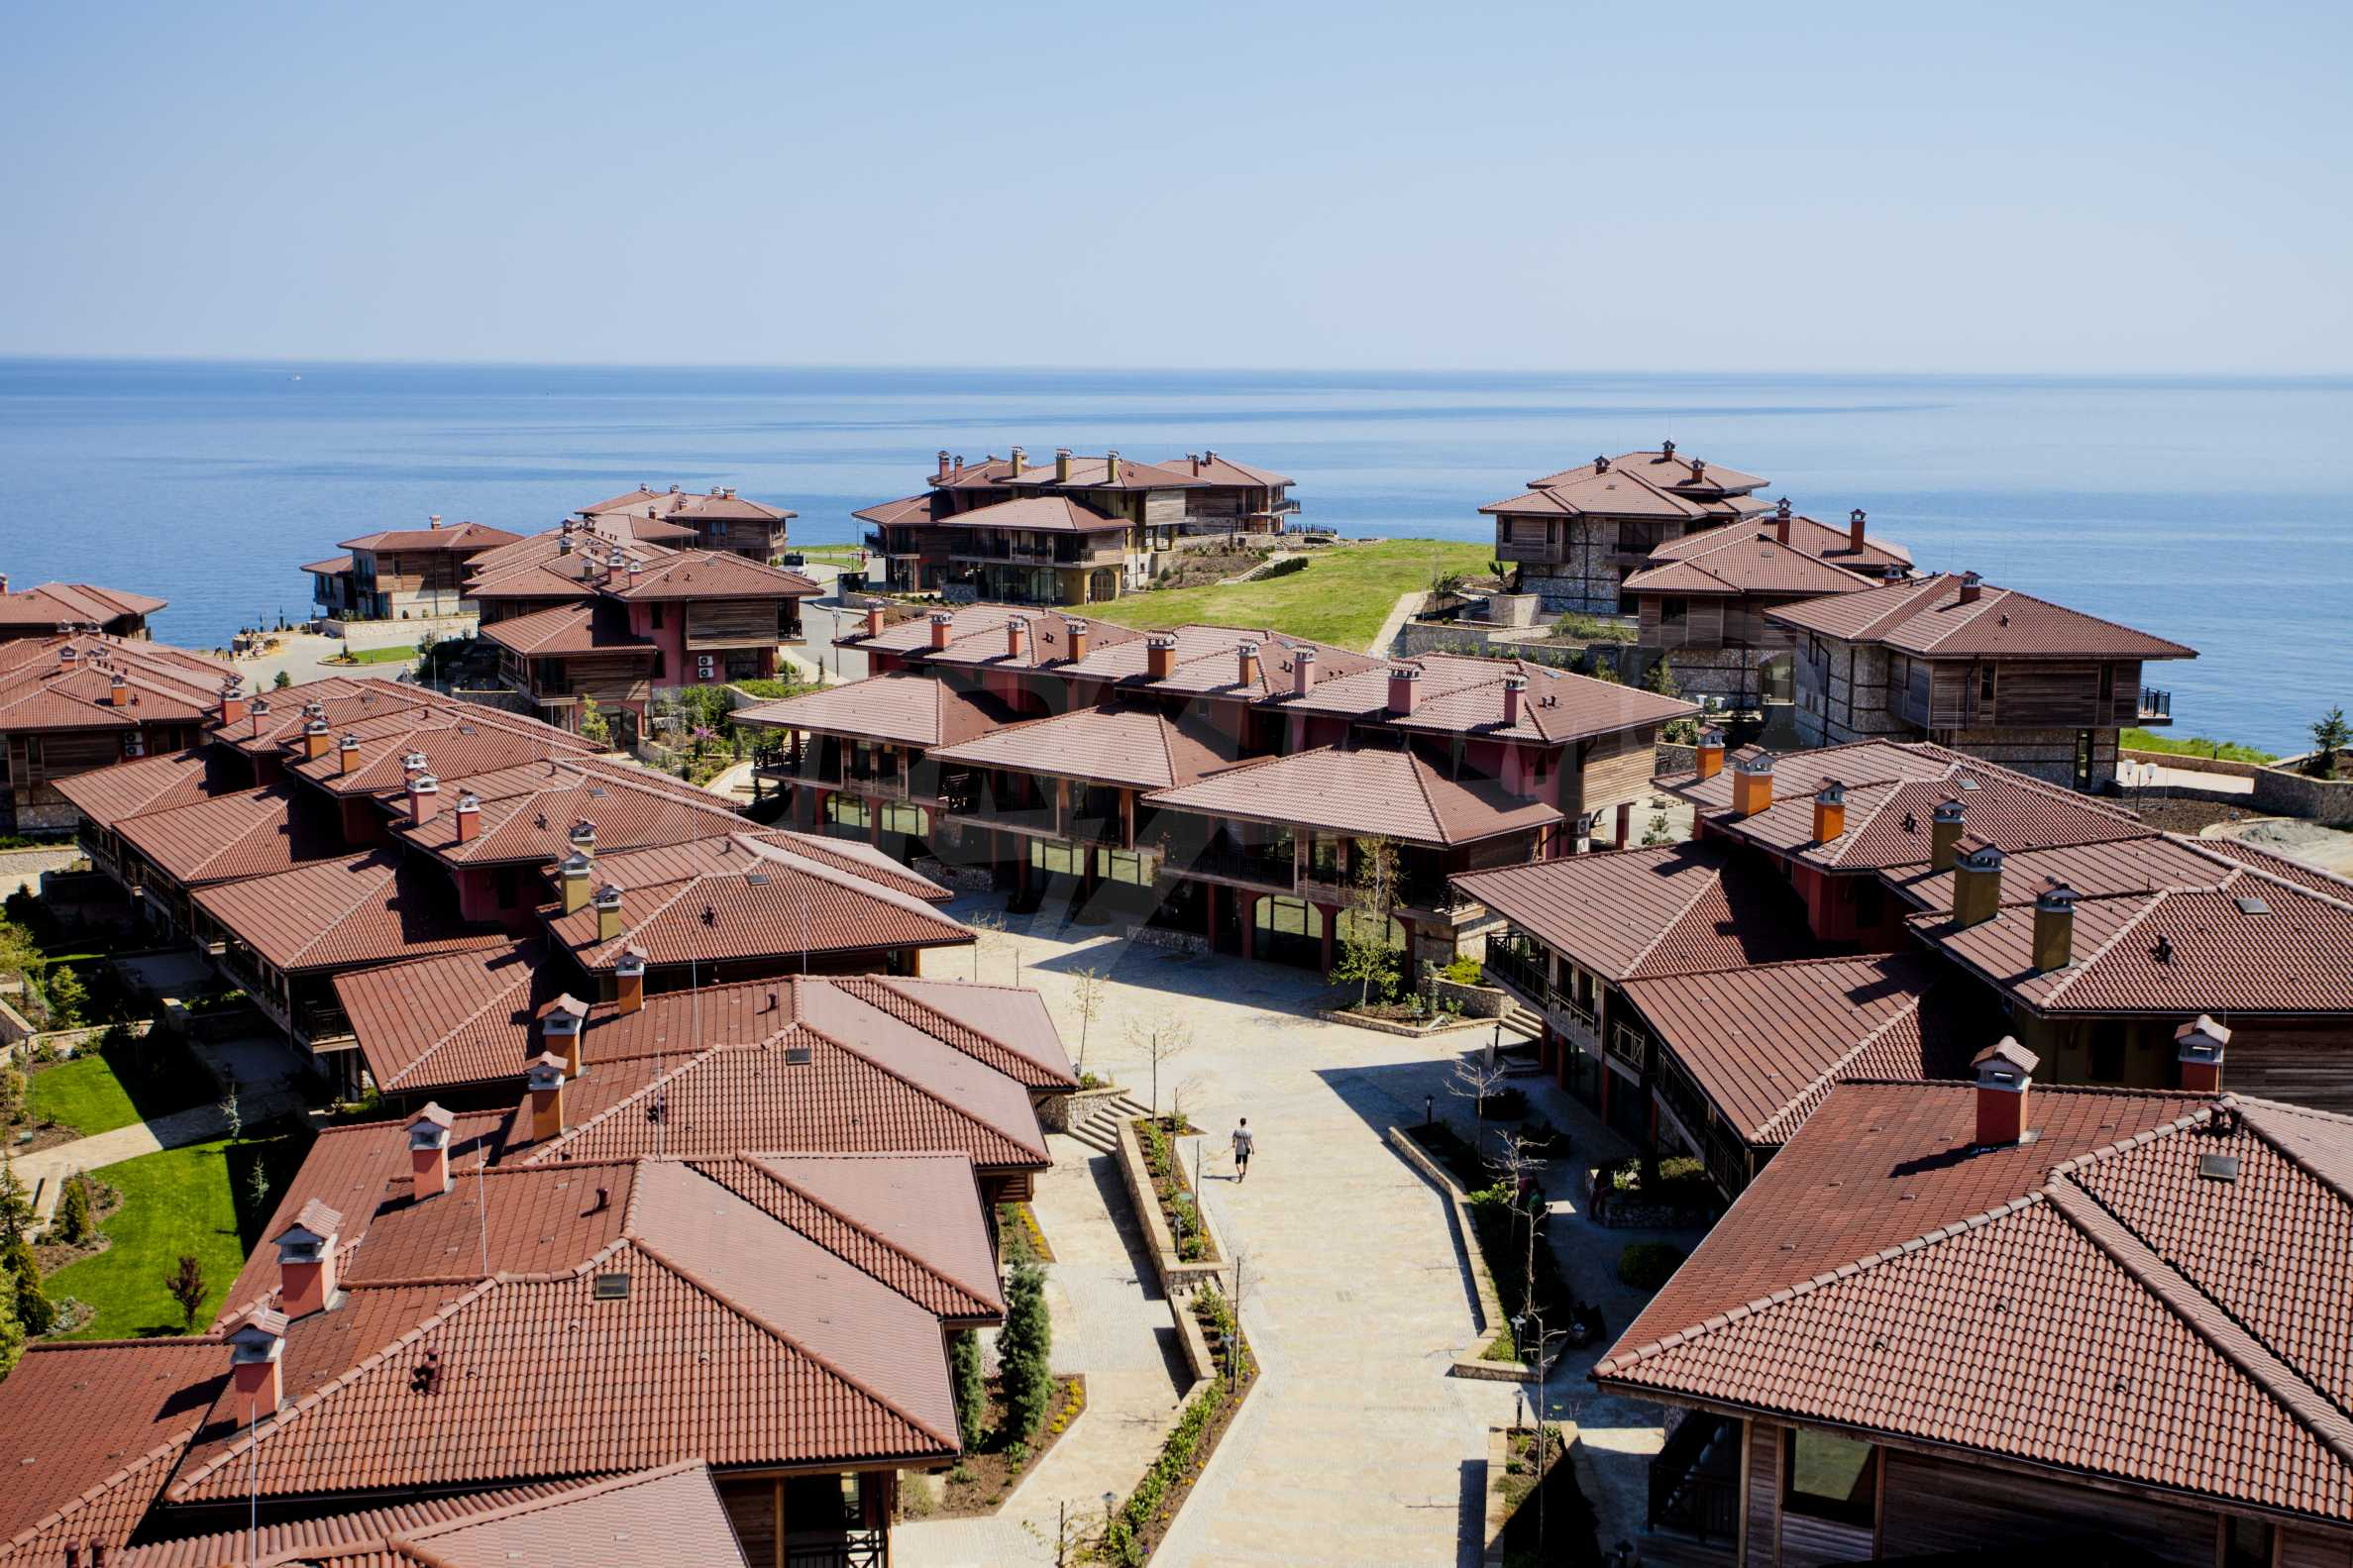 Sozopolis - unique coastal complex of duplex houses and apartments near Sozopol 42